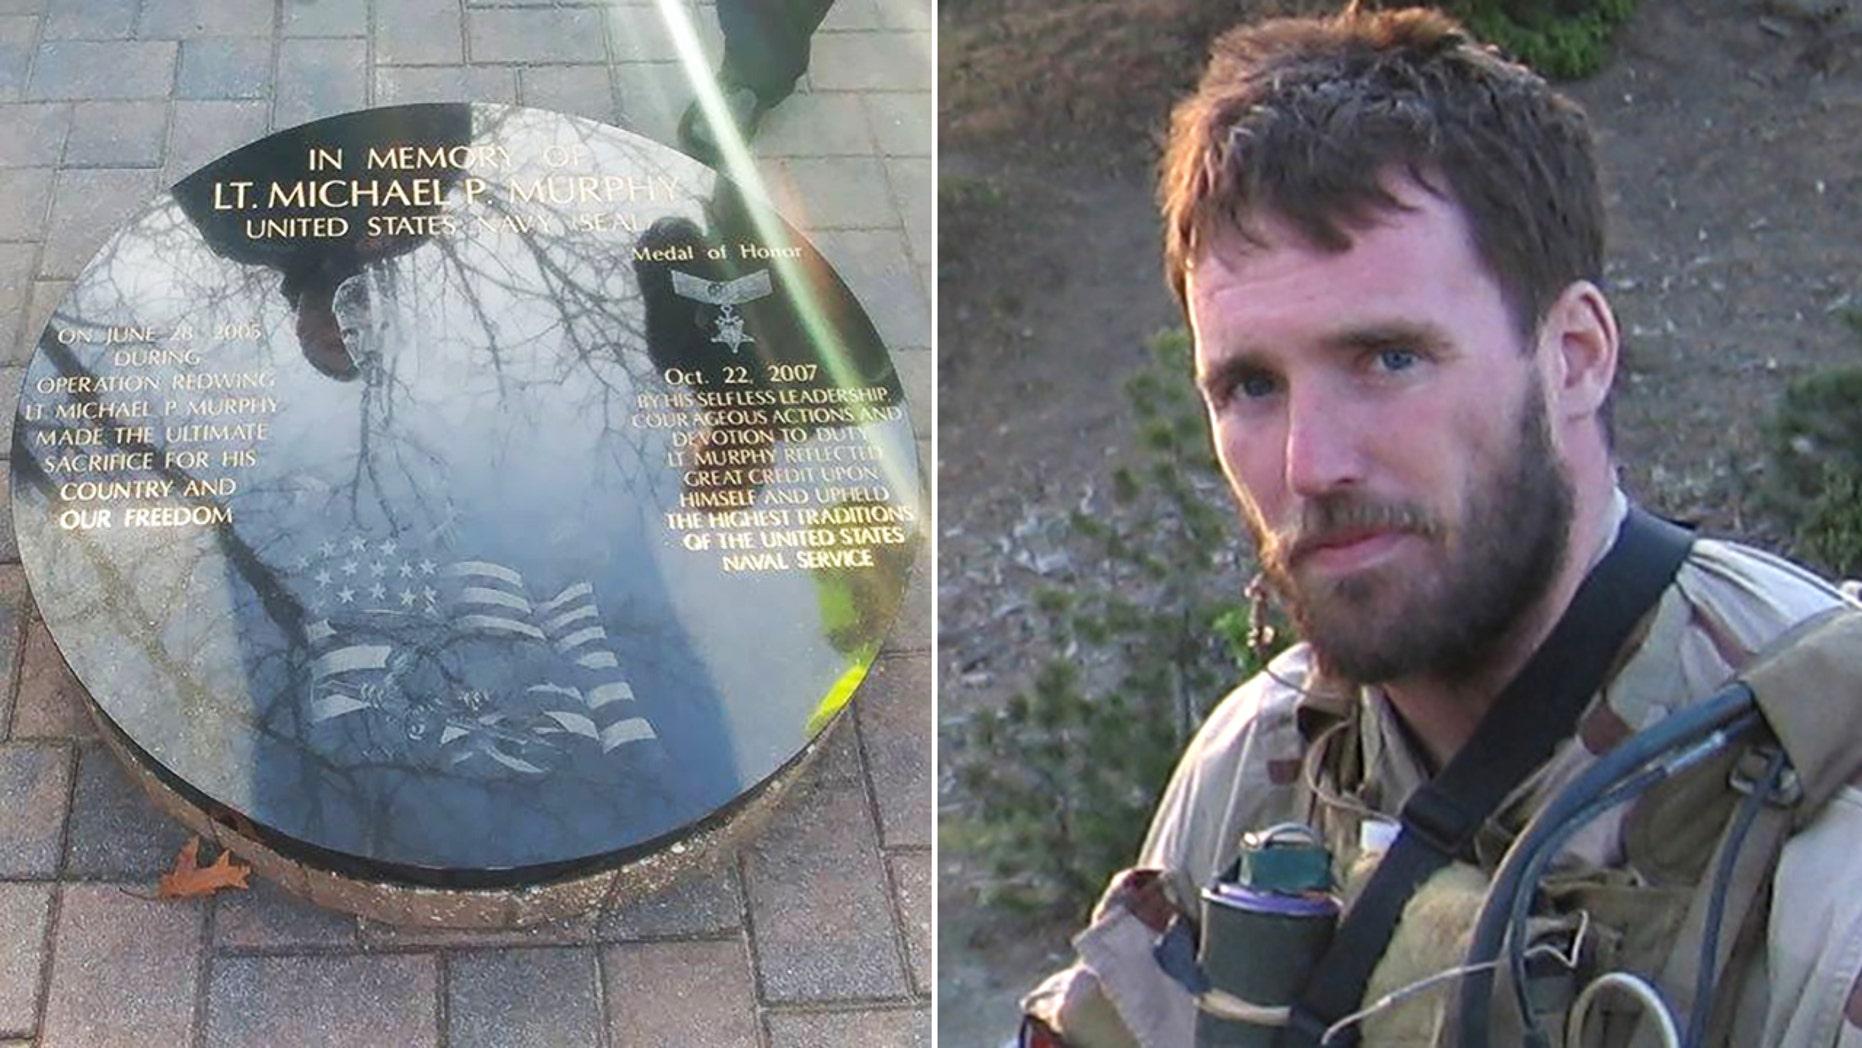 Memorial honoring fallen Navy SEAL, Medal of Honor recipient